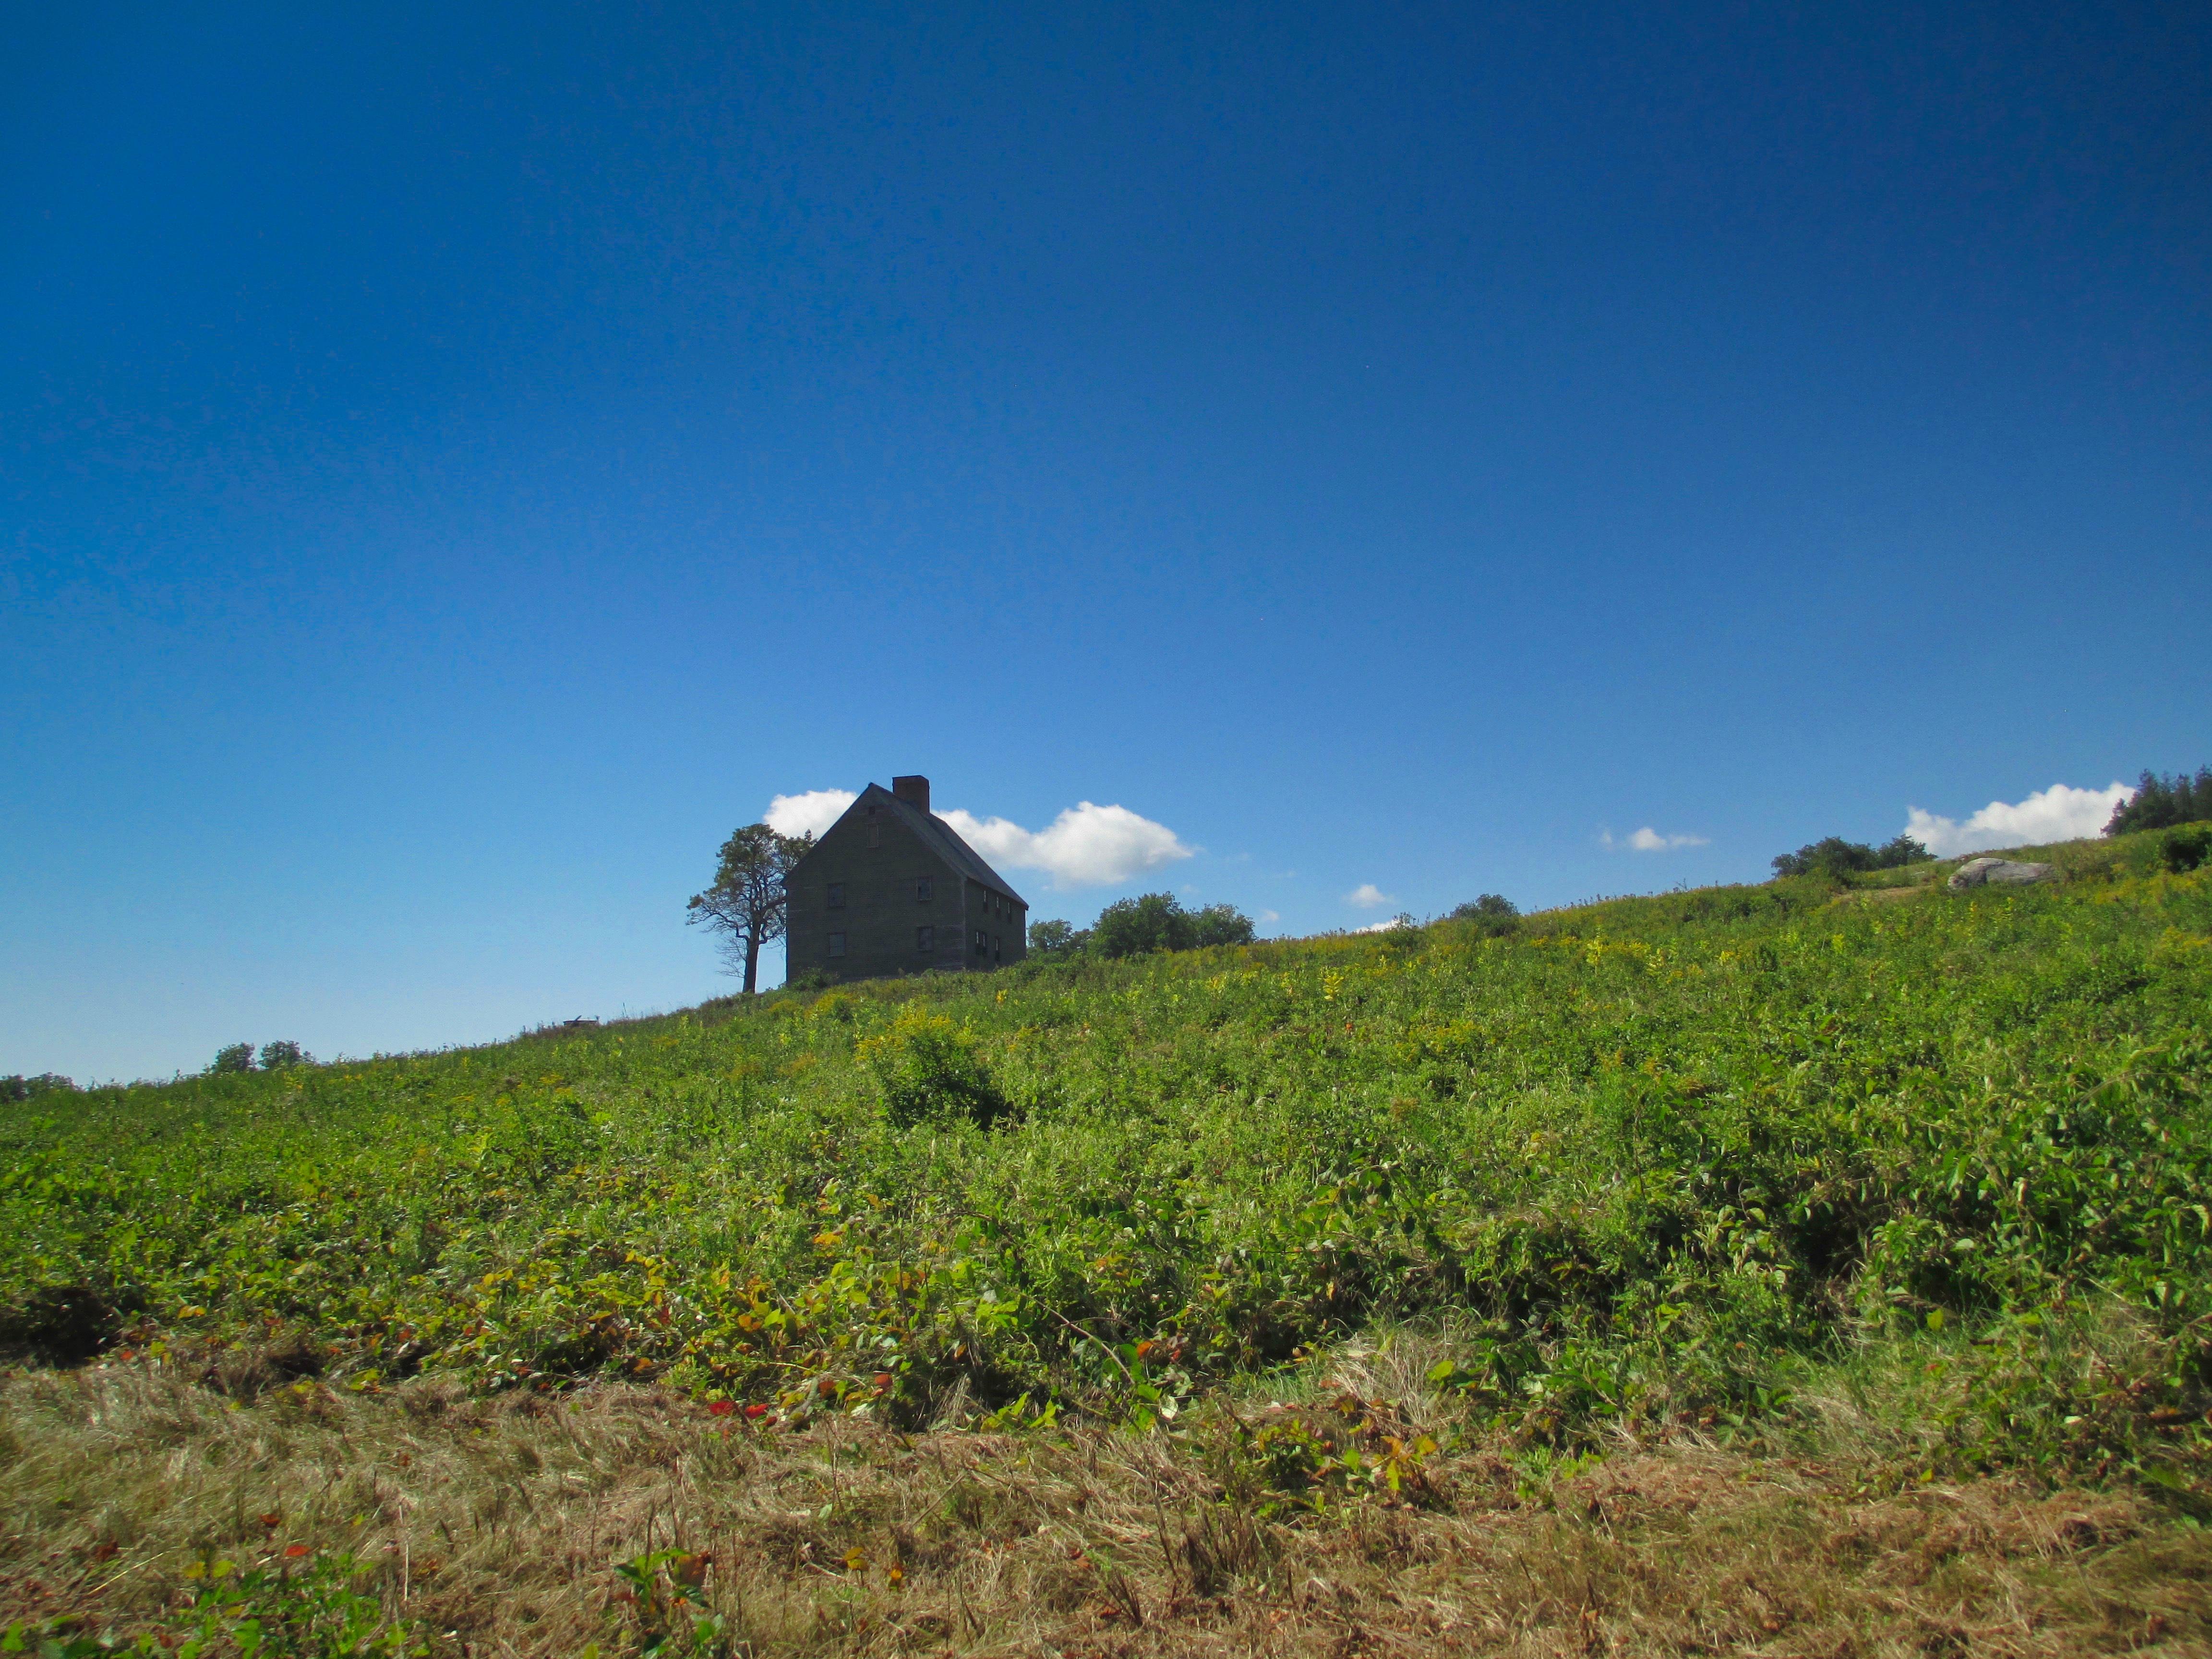 Choate-House-Paddle-and-Hike